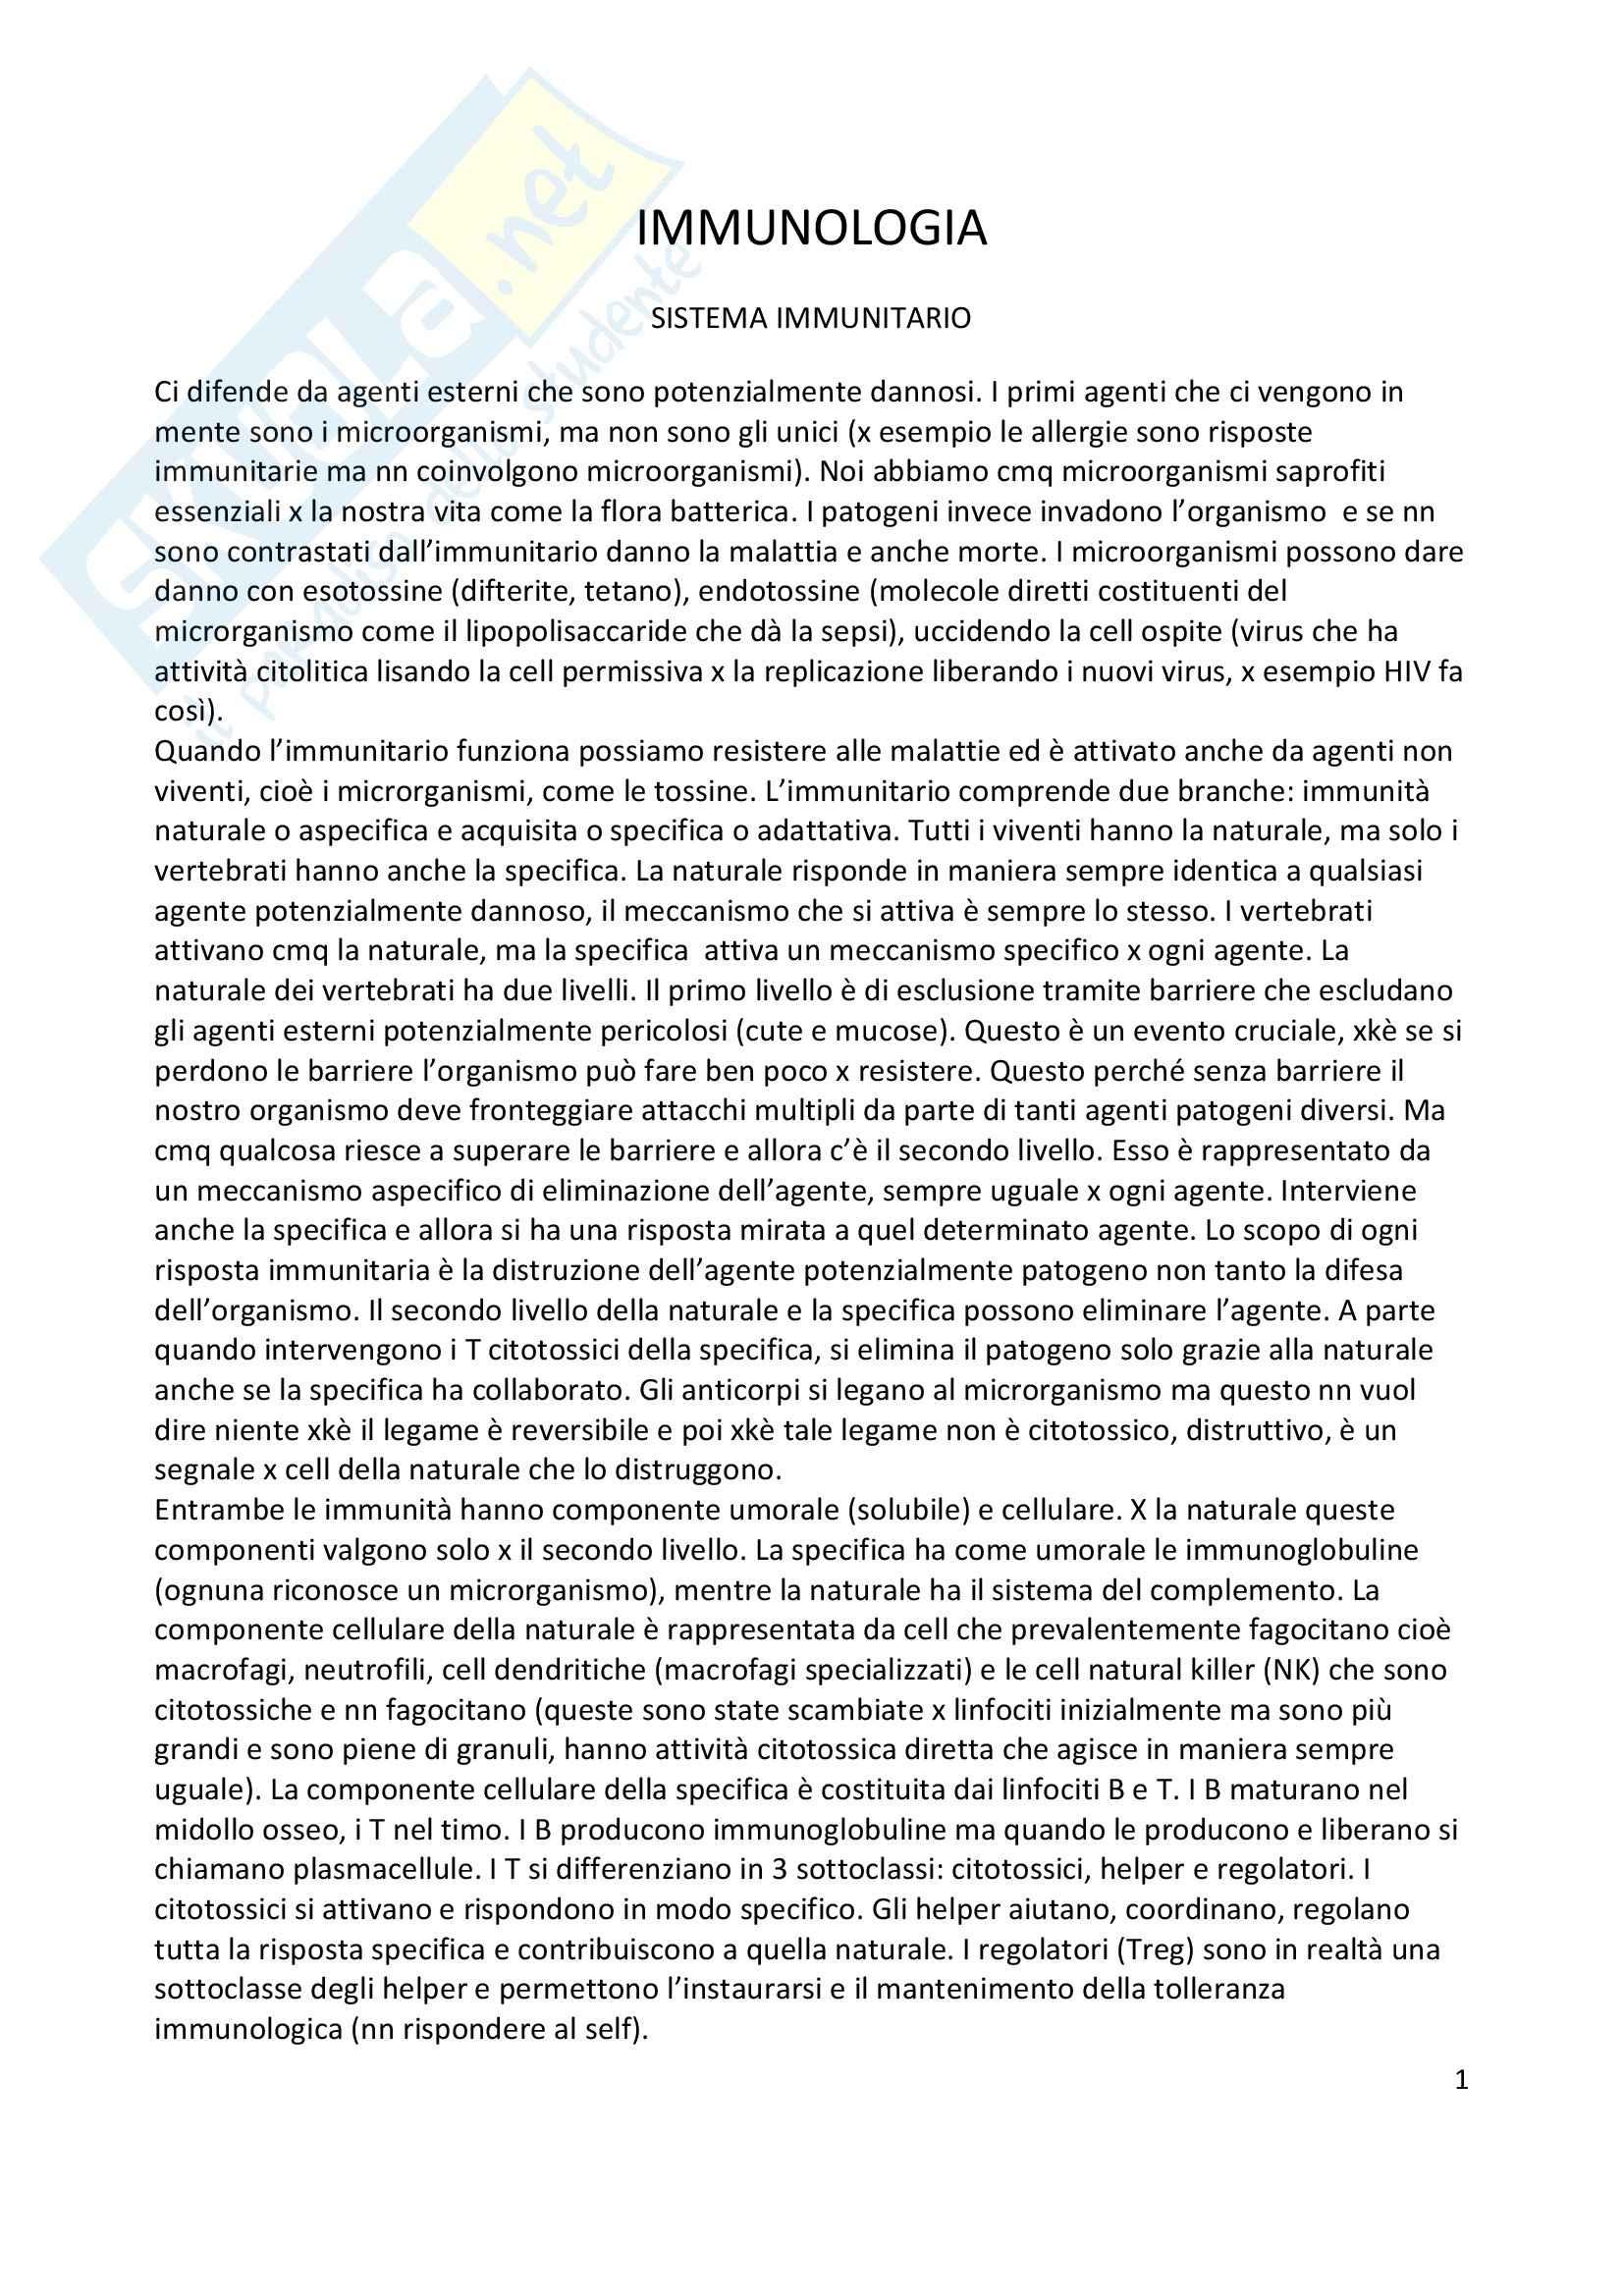 Immunologia - Appunti